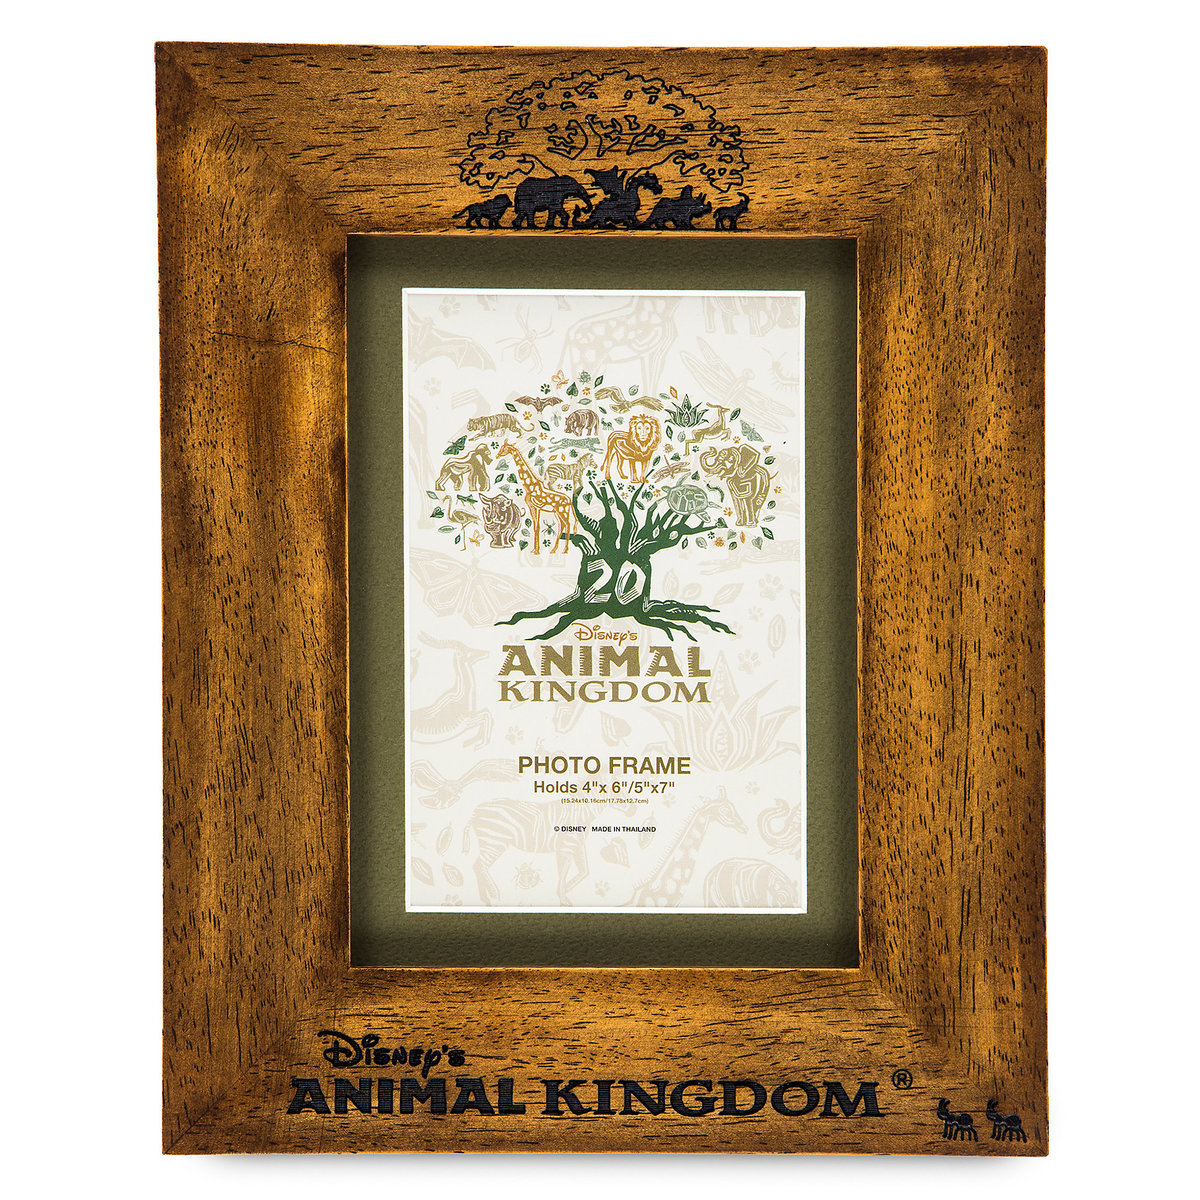 Disney Photo Frame - Animal Kingdom 20th Anniversary - 4 x 6 or 5 x 7